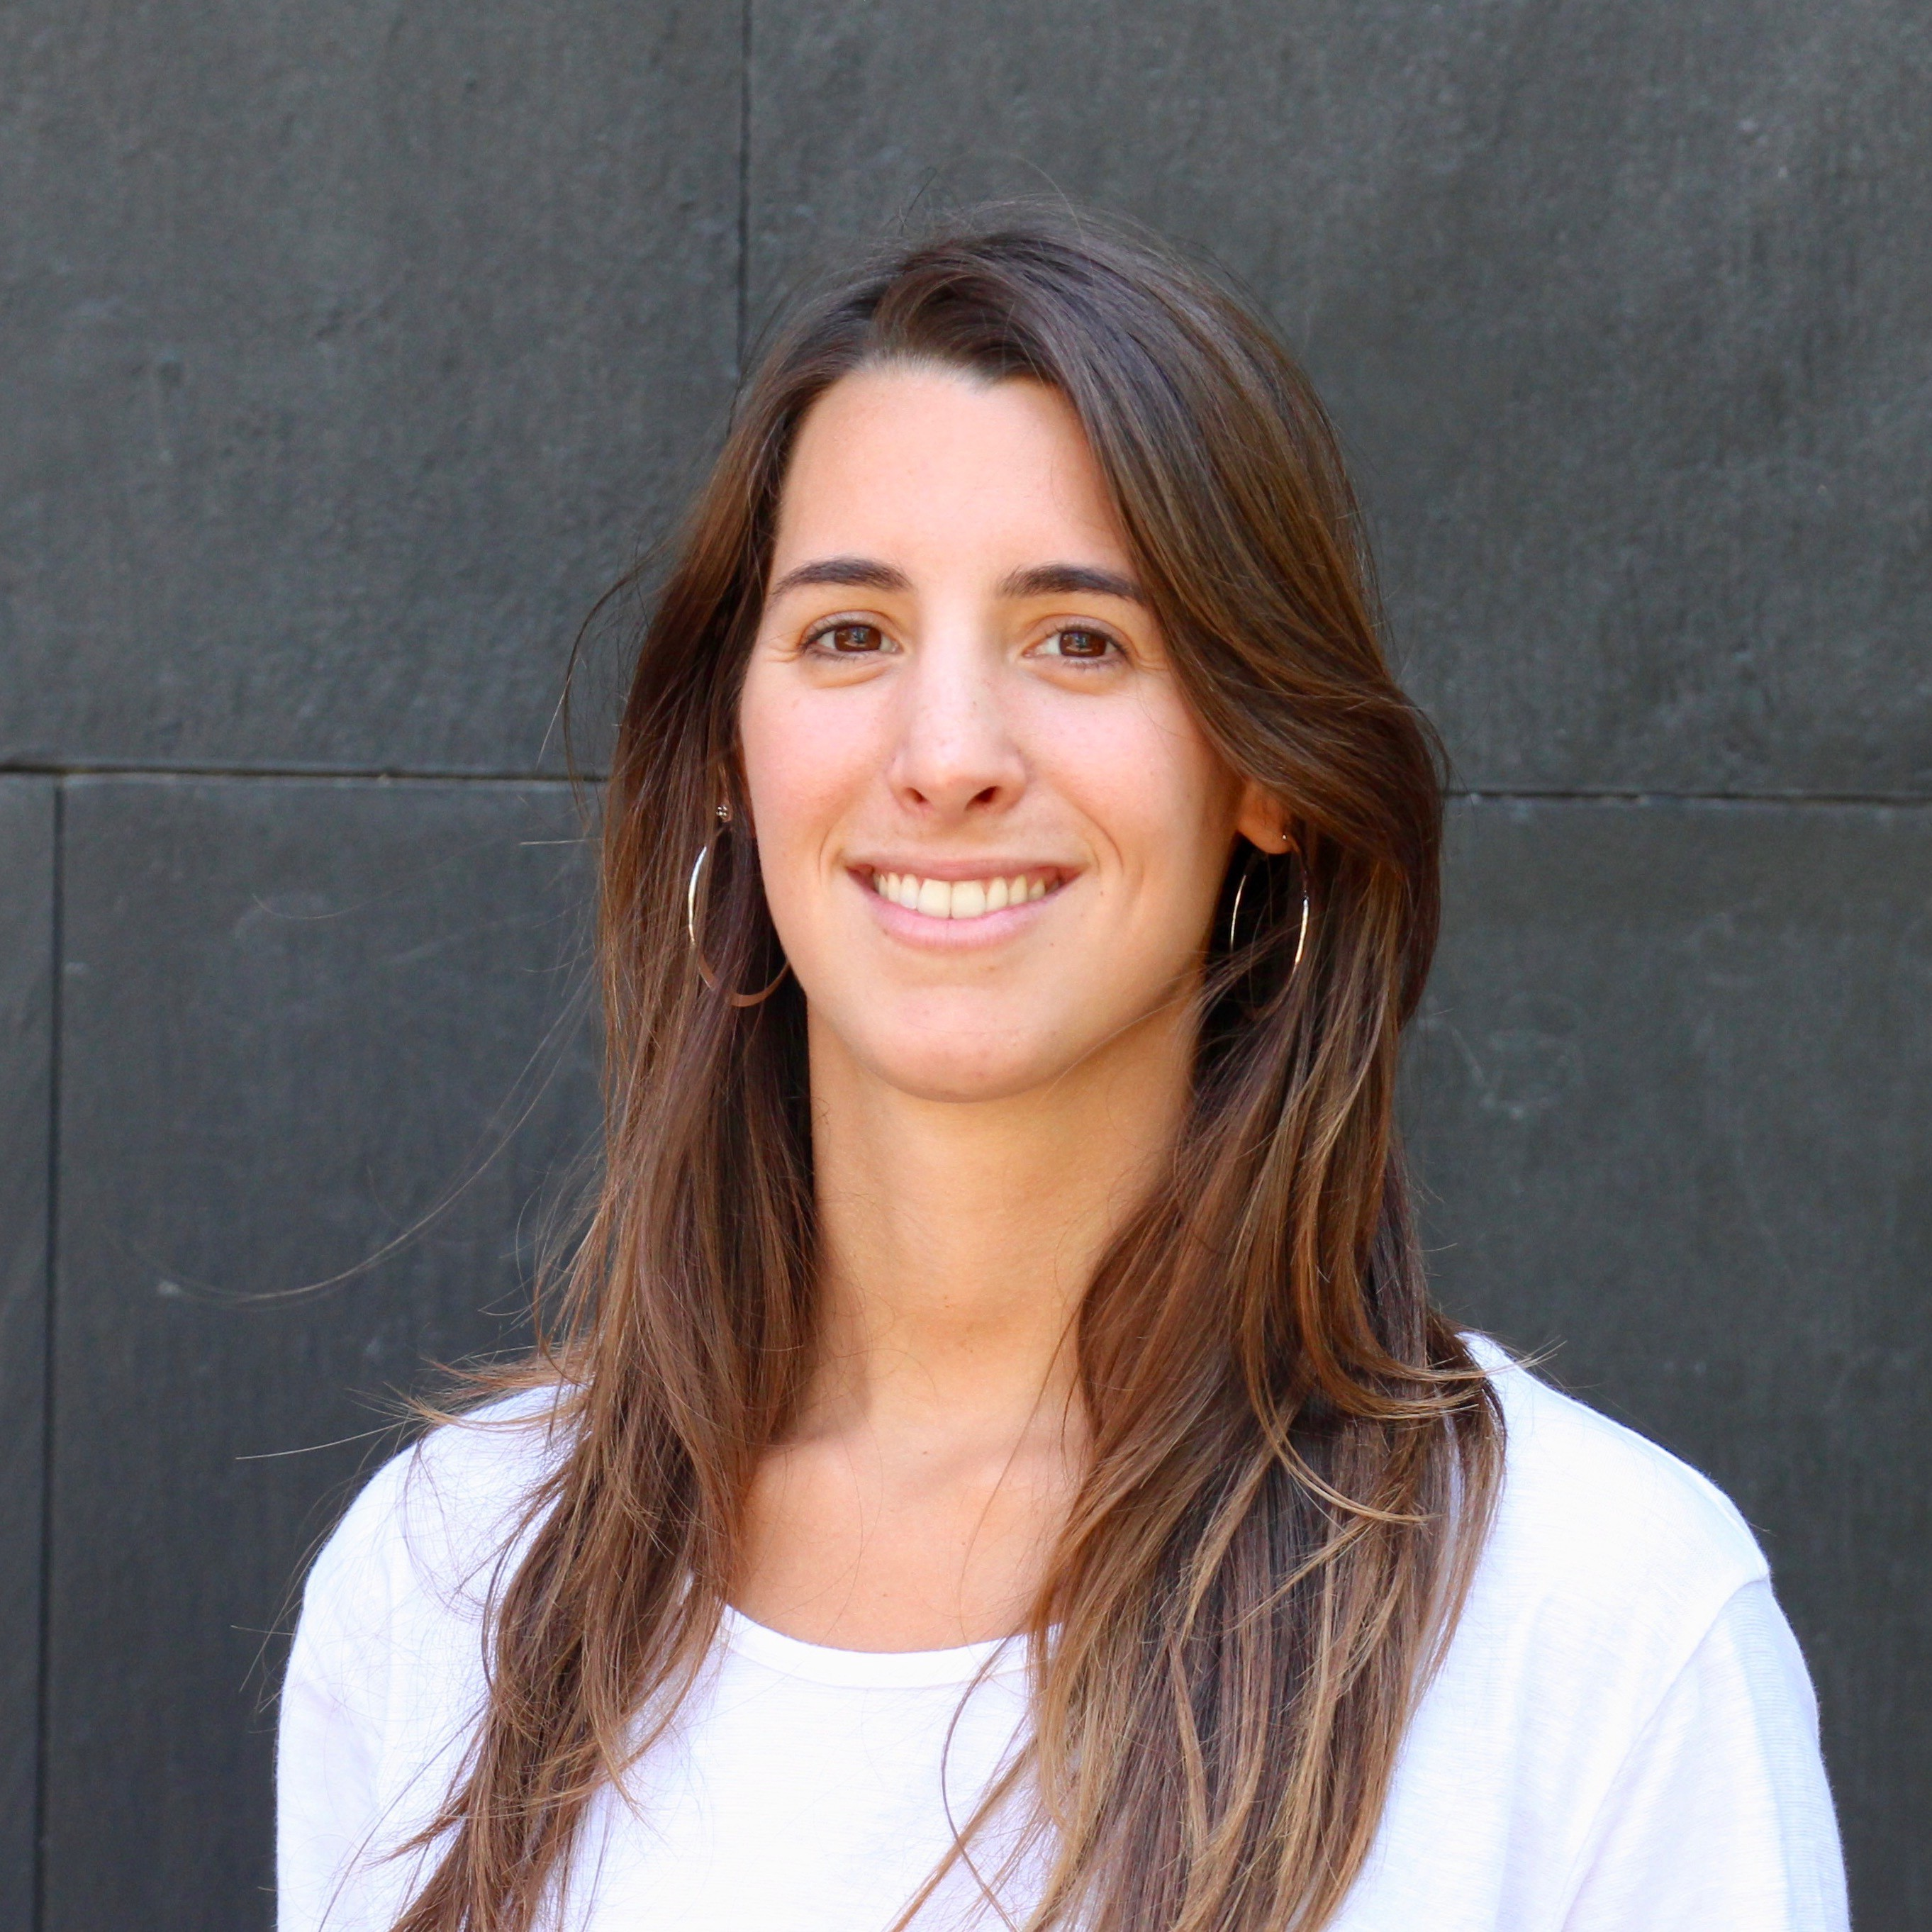 Jesica Oyarbide